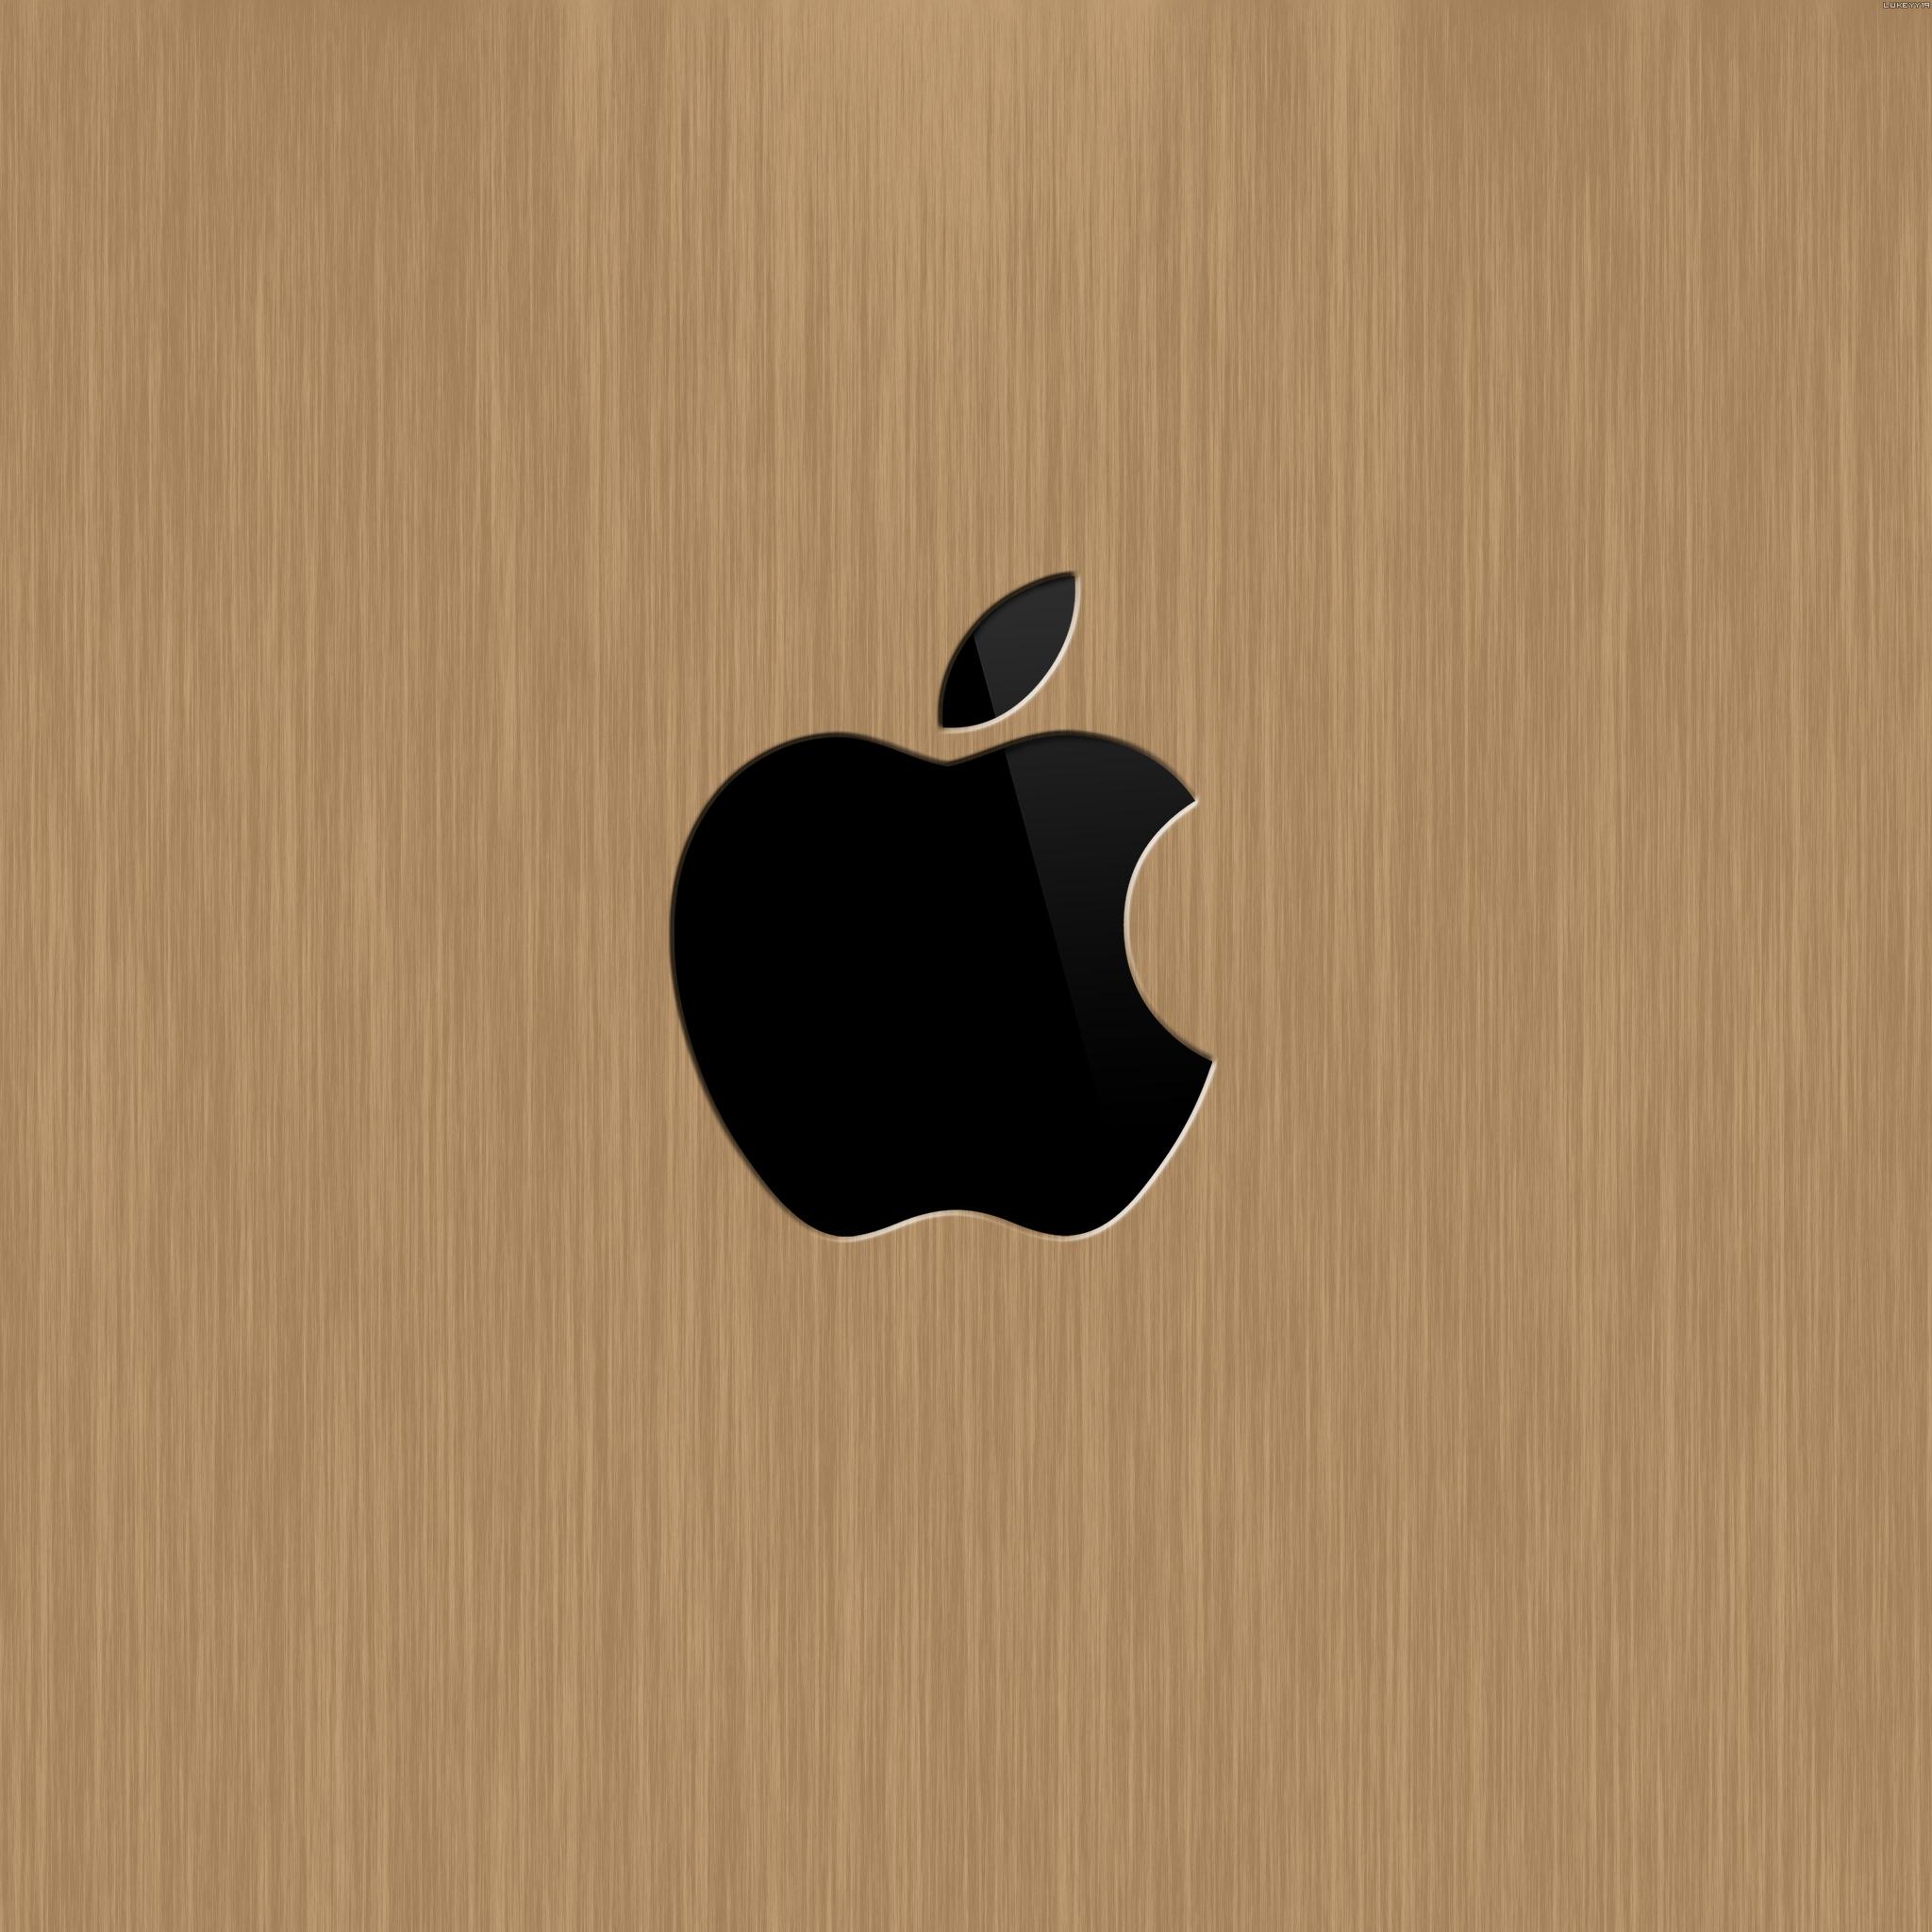 厳選ipad壁紙 48x48 03 Apple 76枚 Blog Nobon